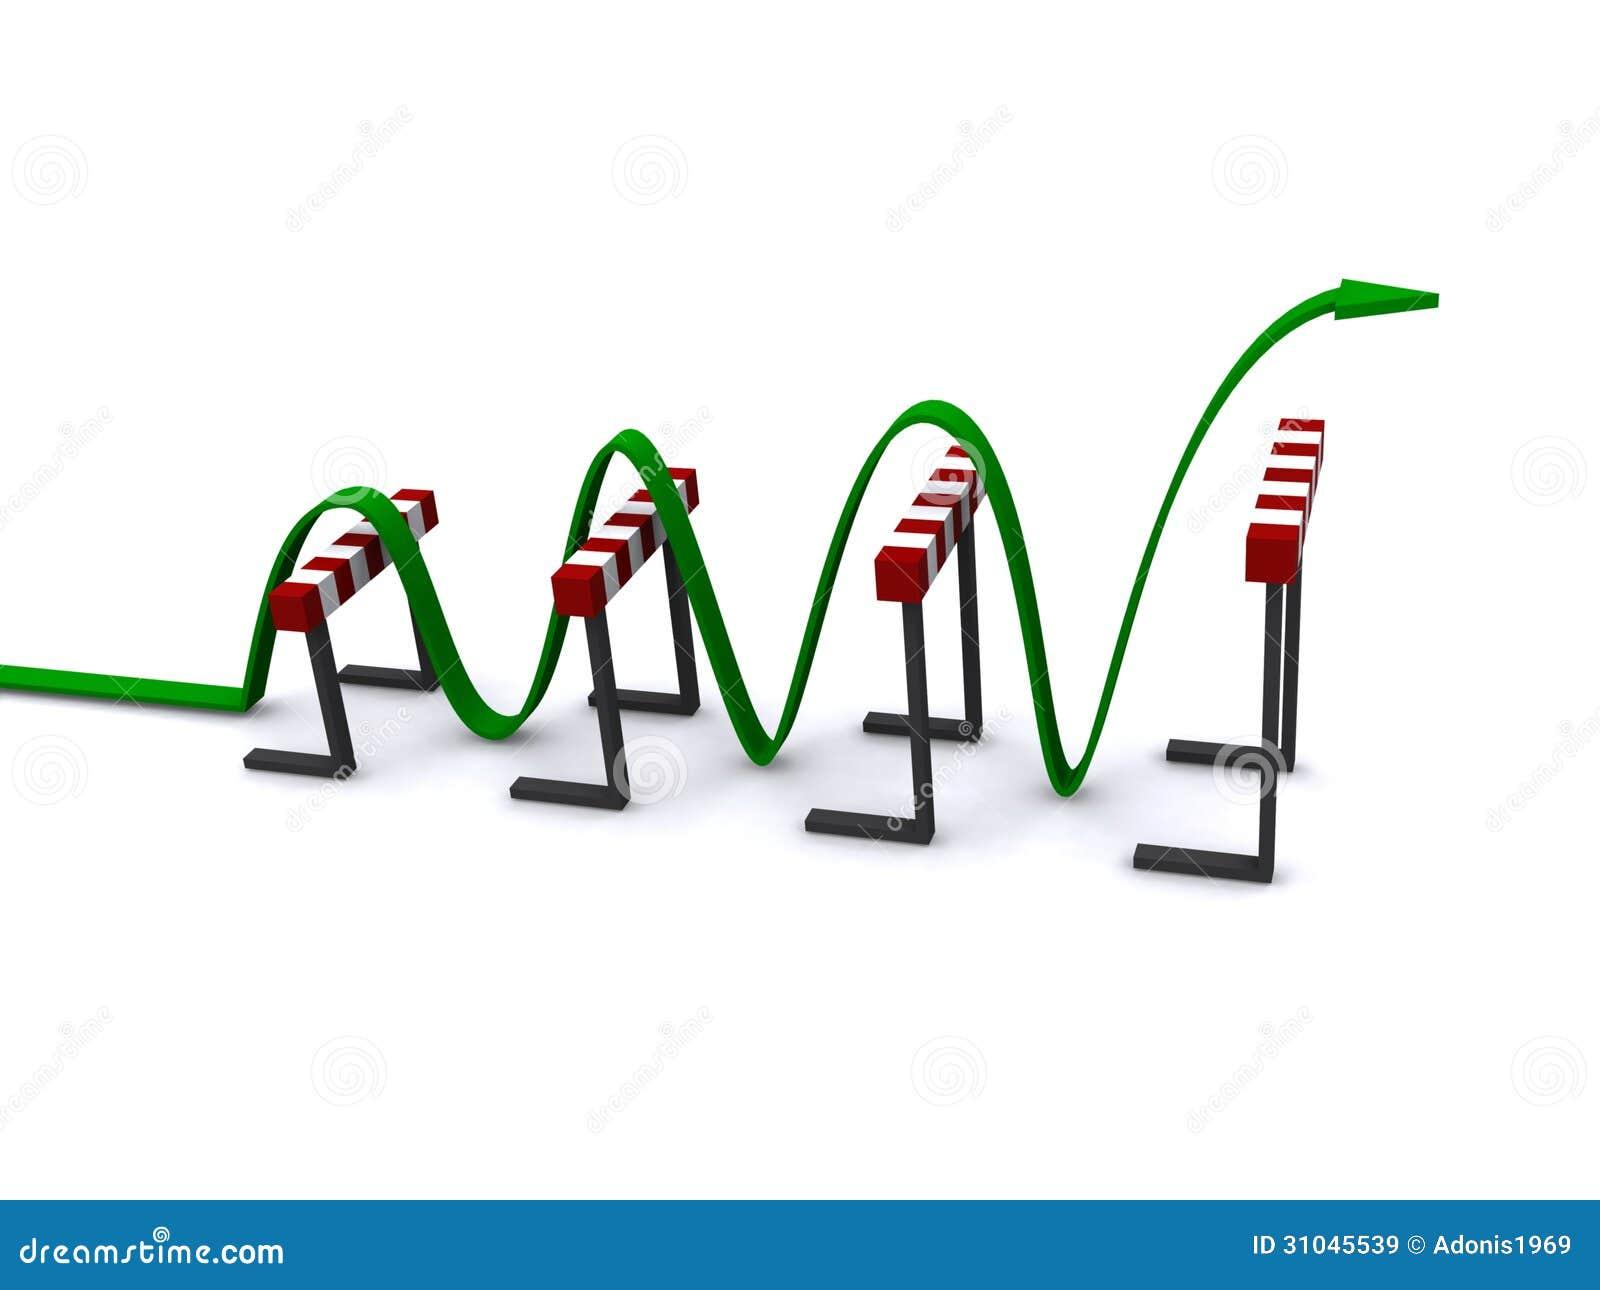 Green Arrow Jumping Over Hurdles Royalty Free Stock Images - Image ...